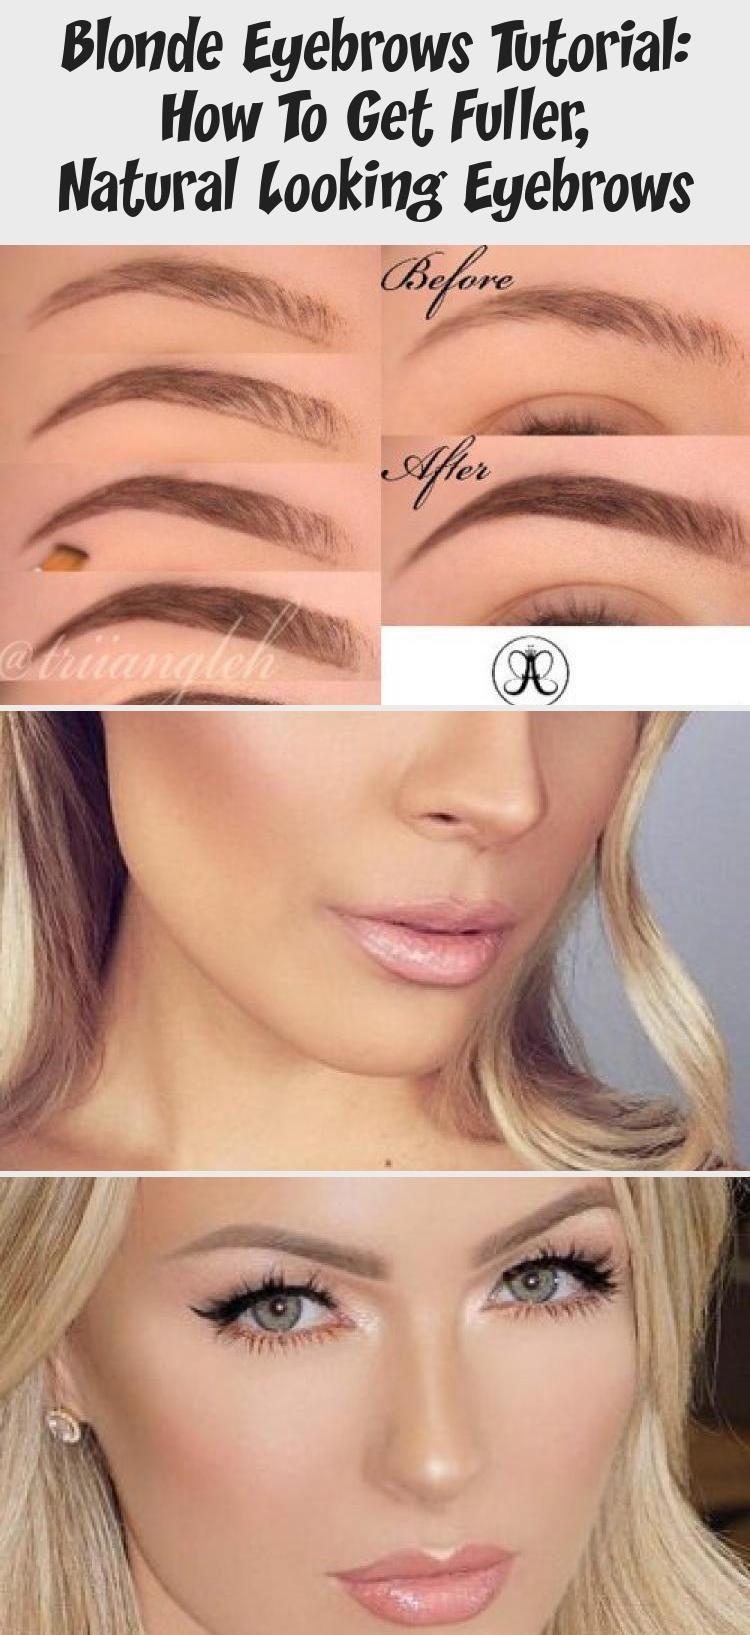 Blonde Eyebrows Tutorial How To Get Fuller Natural Looking Eyebrows Makeup In 2020 Blonde Eyebrows Eyebrows Eyebrow Tutorial